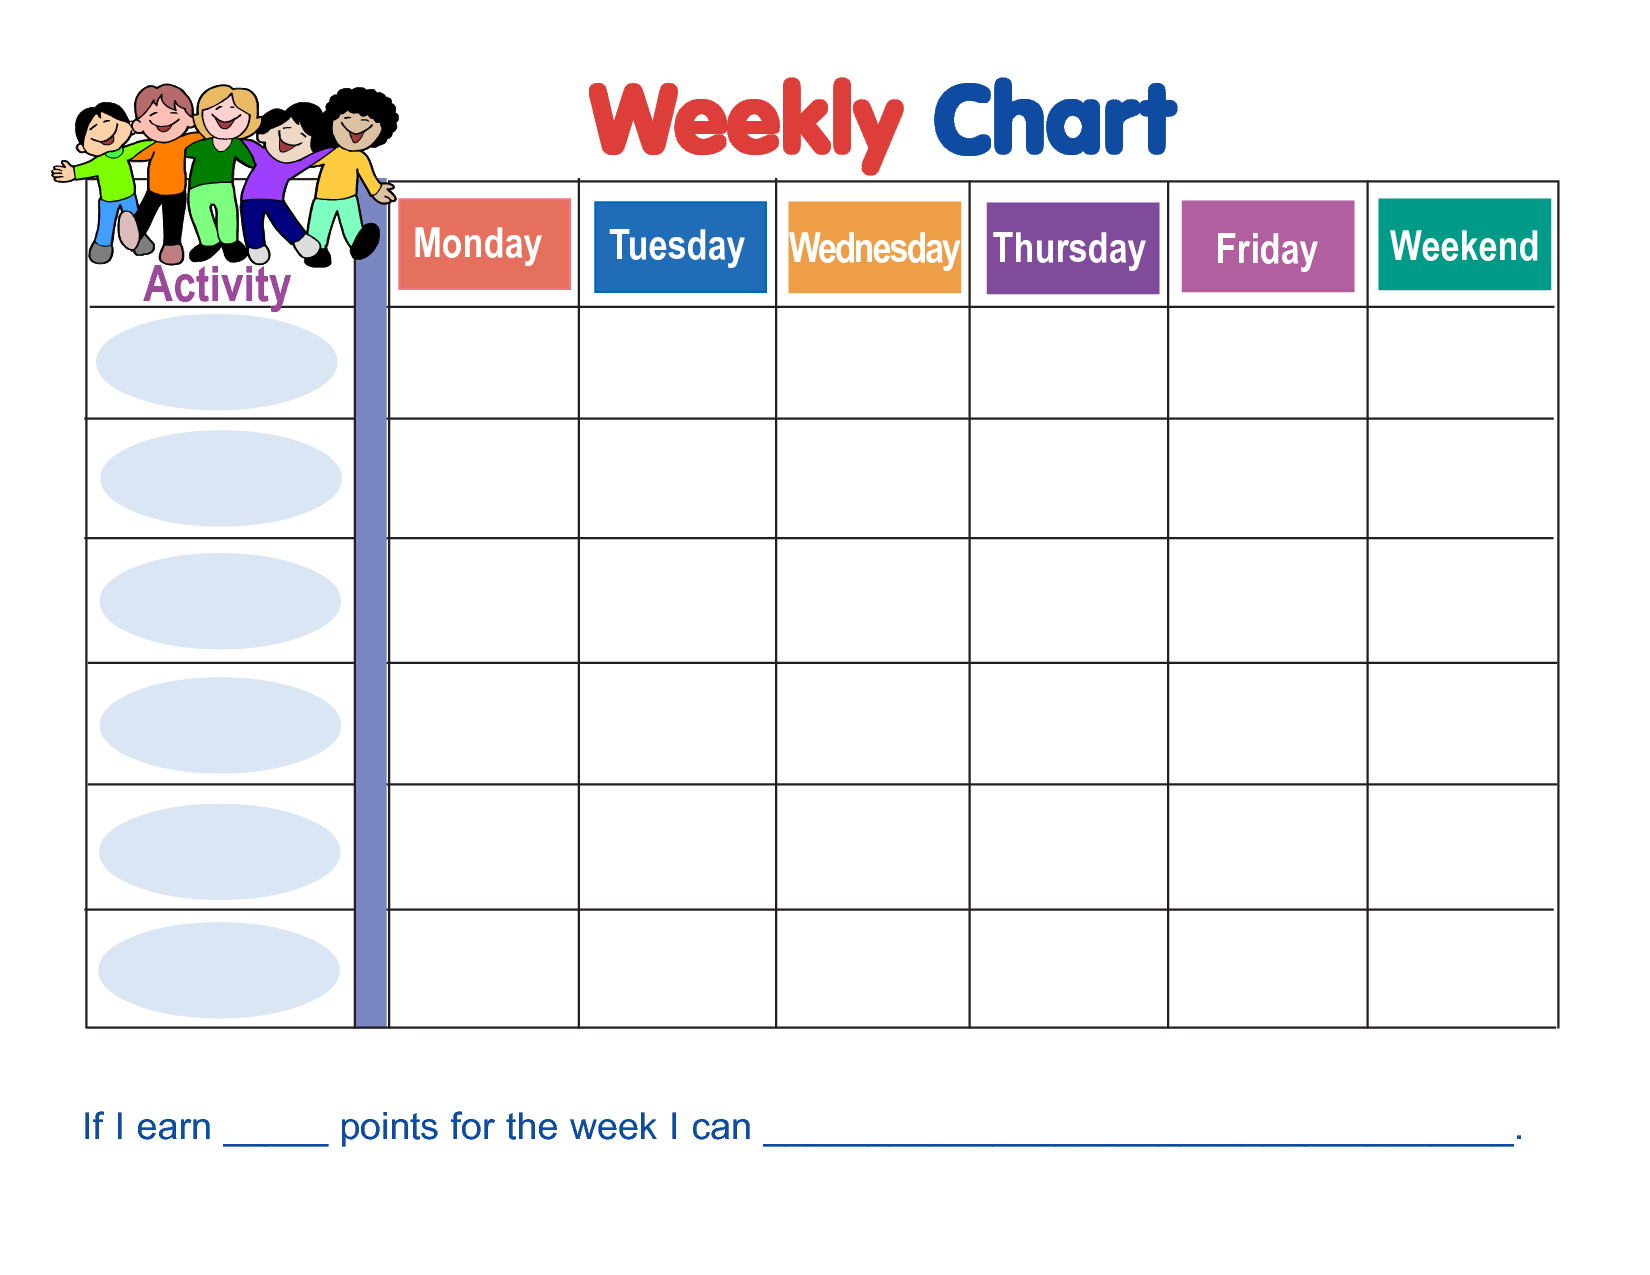 Weekly Behavior Chart Template | Wyatt | Weekly Behavior Charts in Free Printable Blank Behavior Charts